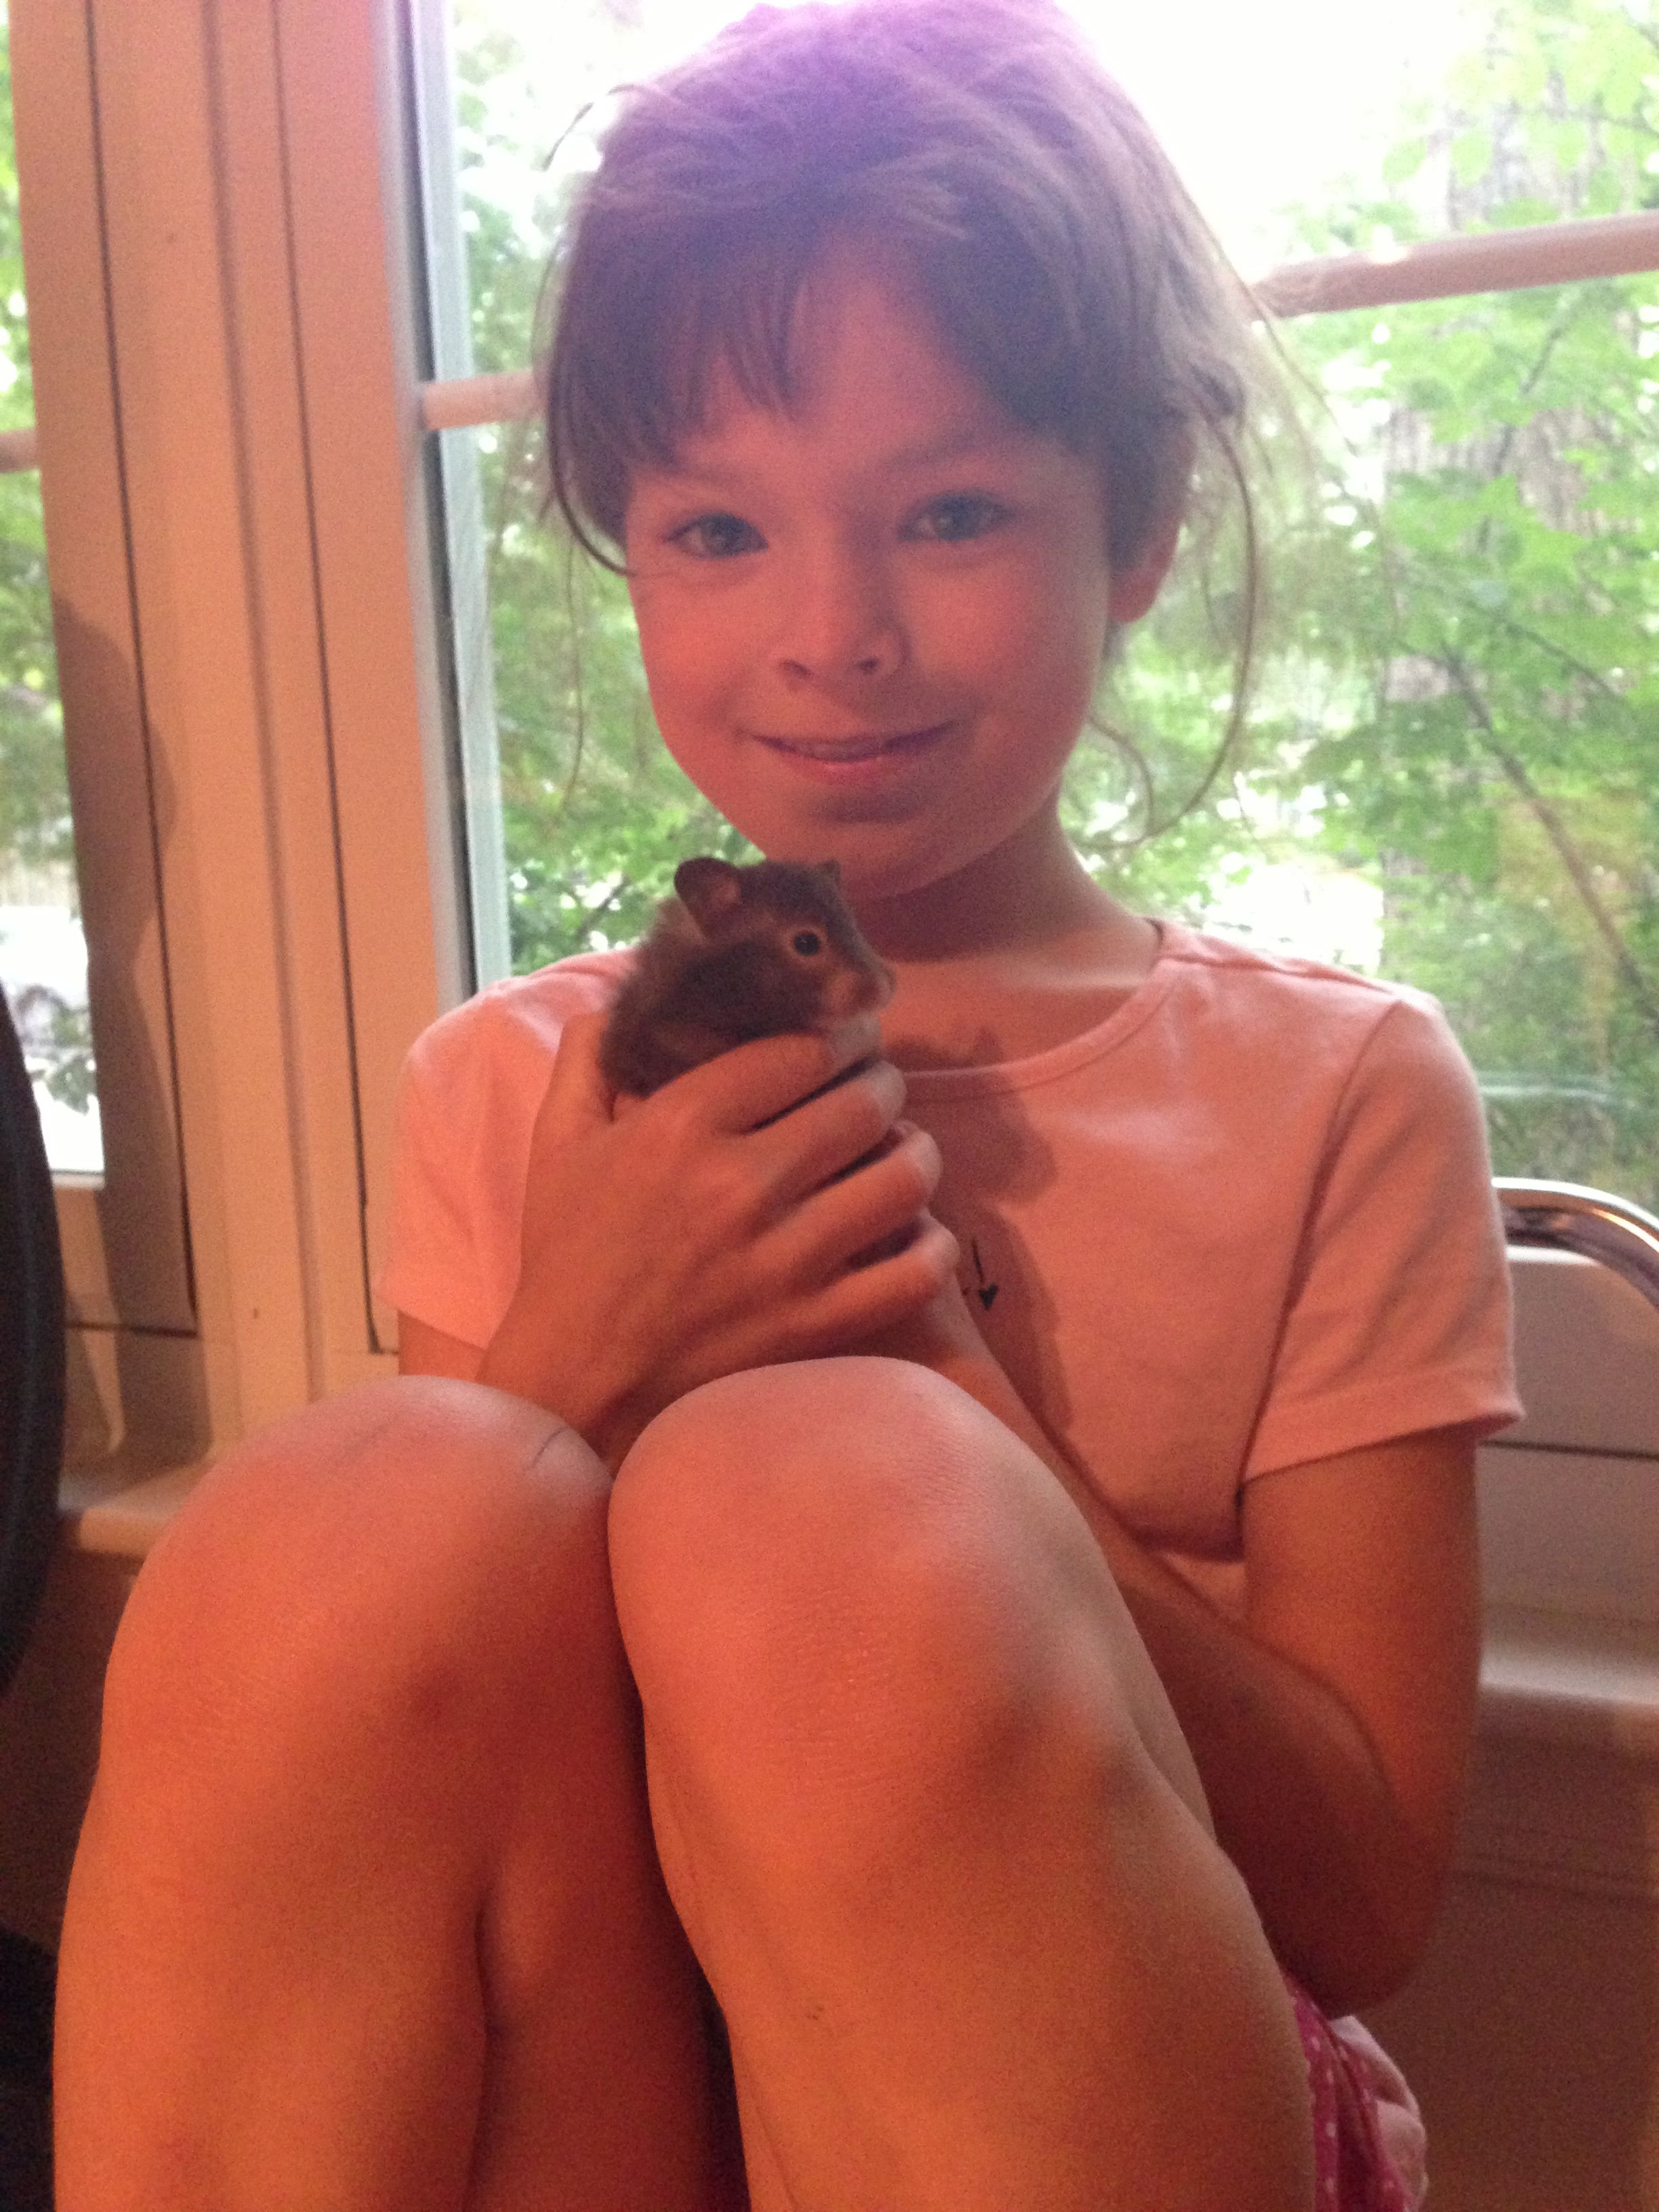 Alora is holding Elizabeth the teddy bear hamster